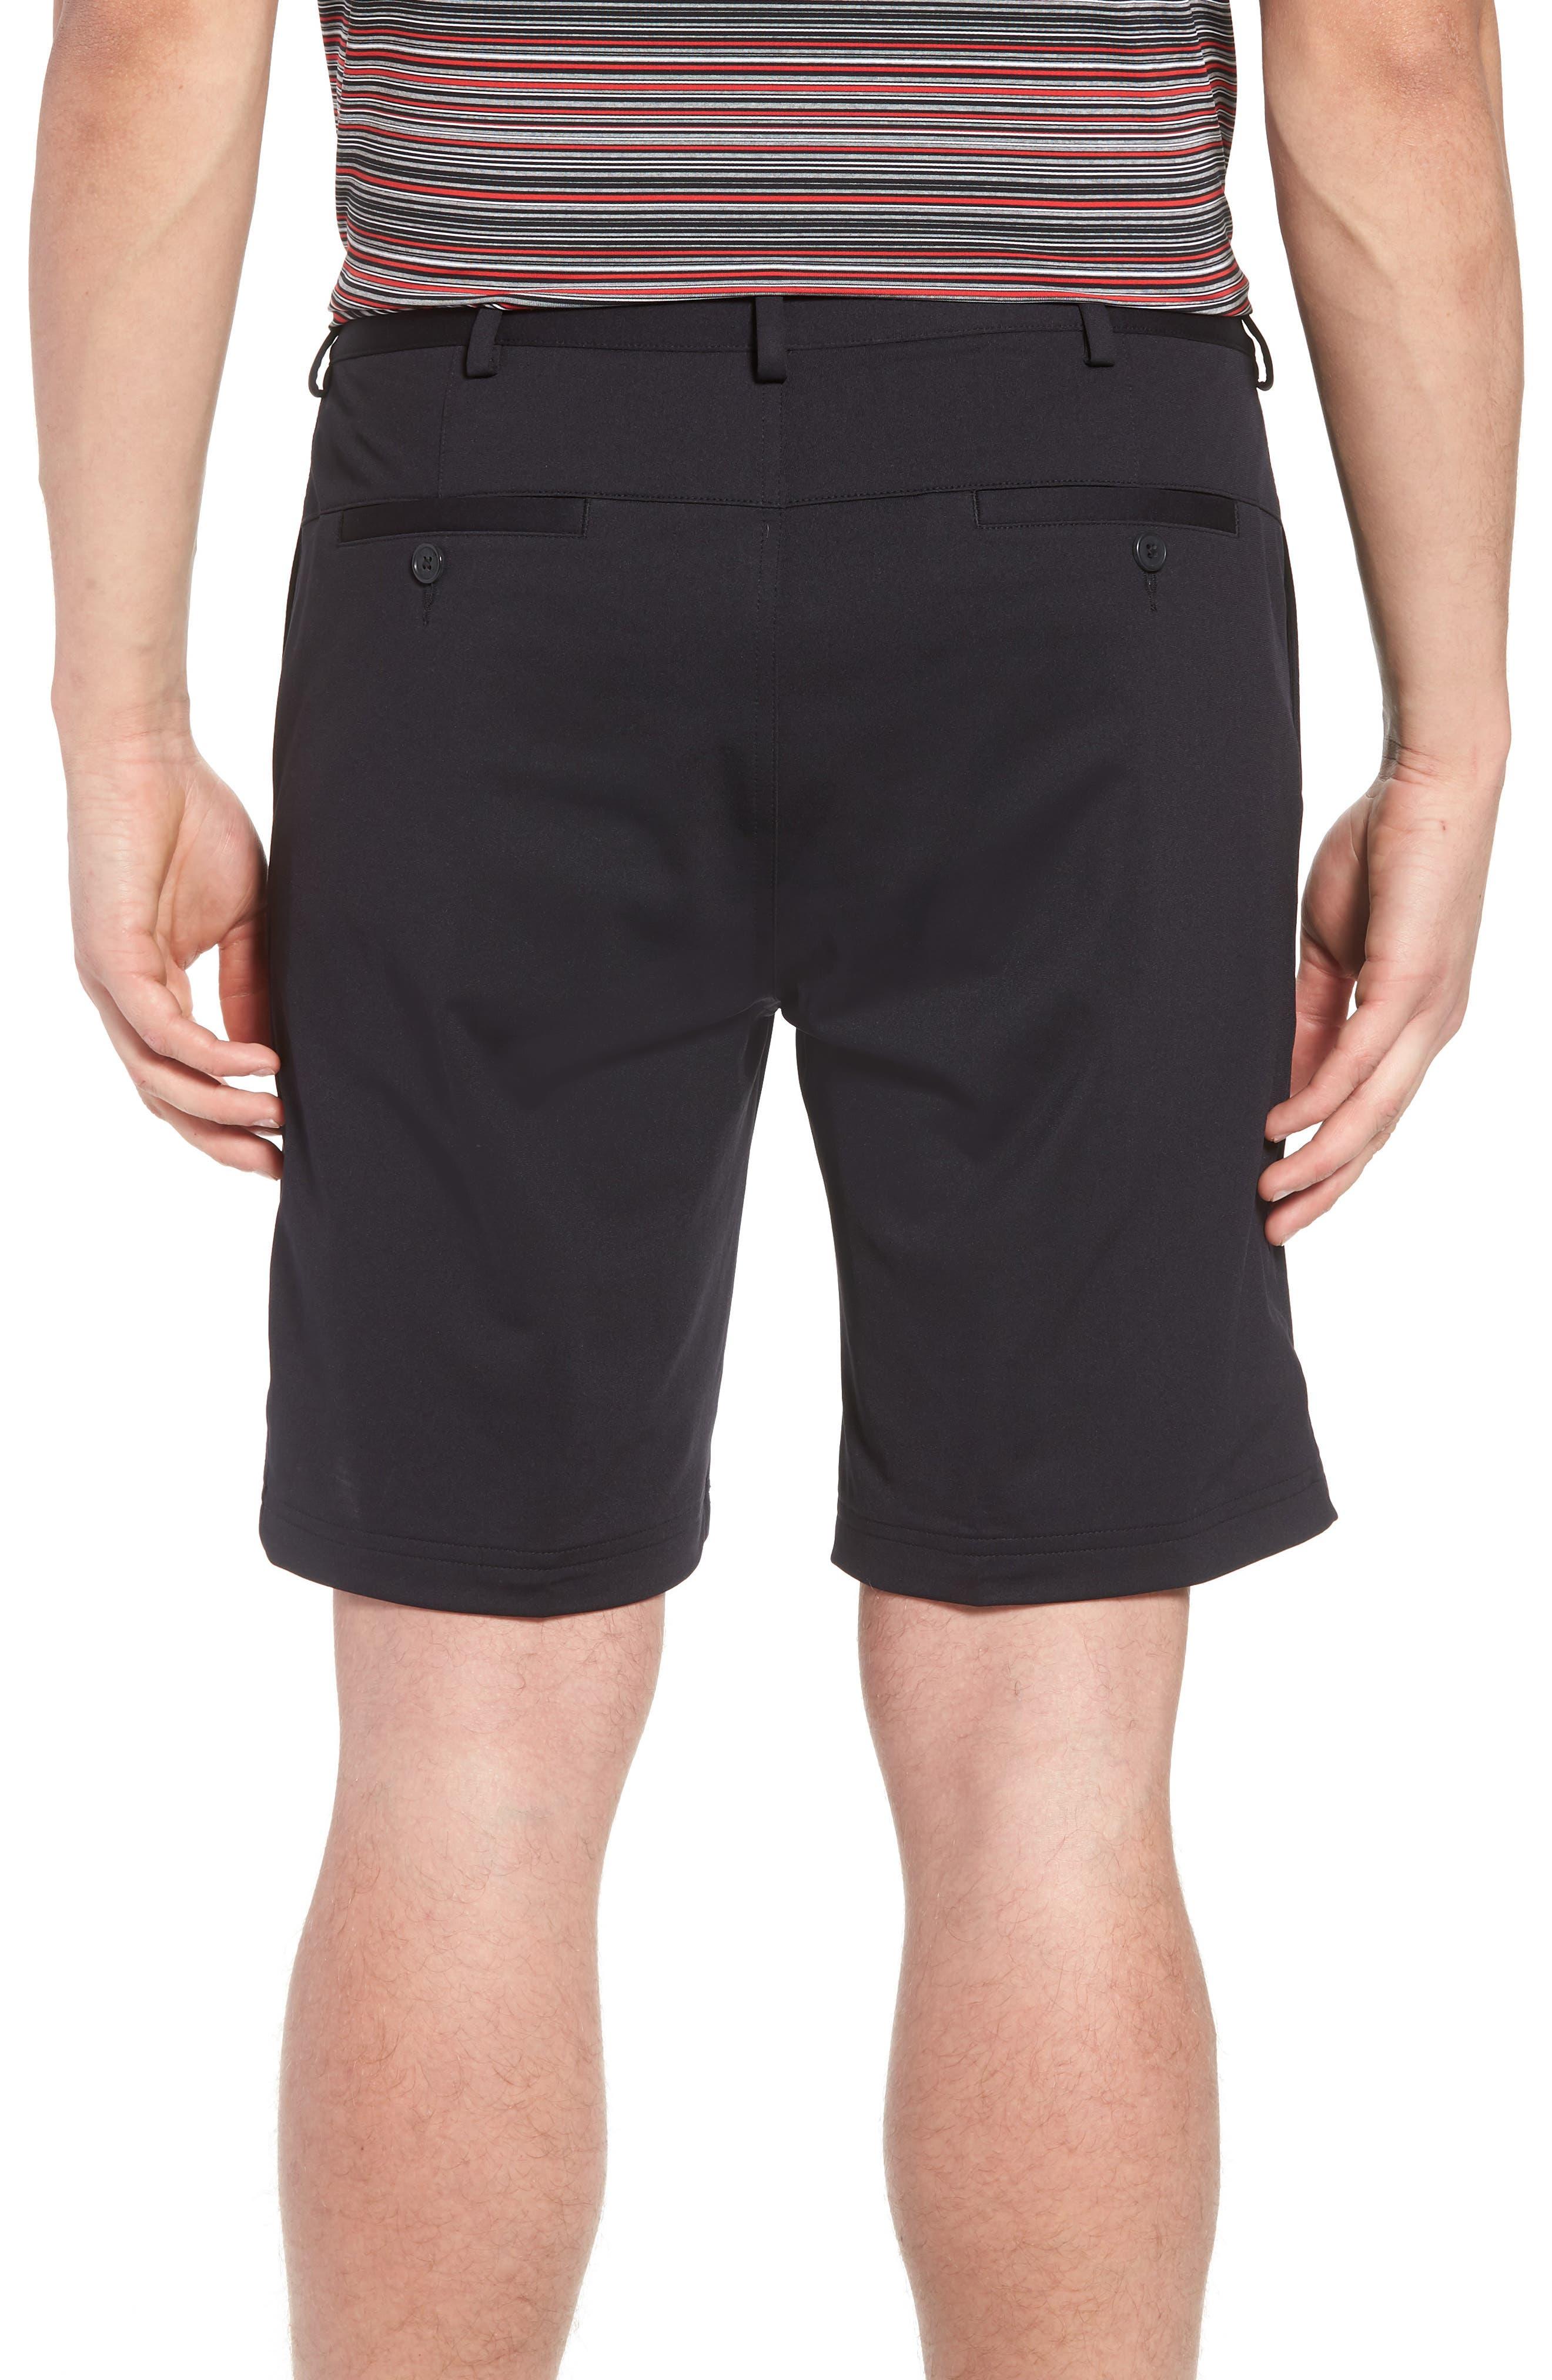 BOBBY JONES,                             Trim Fit Tech Chino Shorts,                             Alternate thumbnail 2, color,                             001